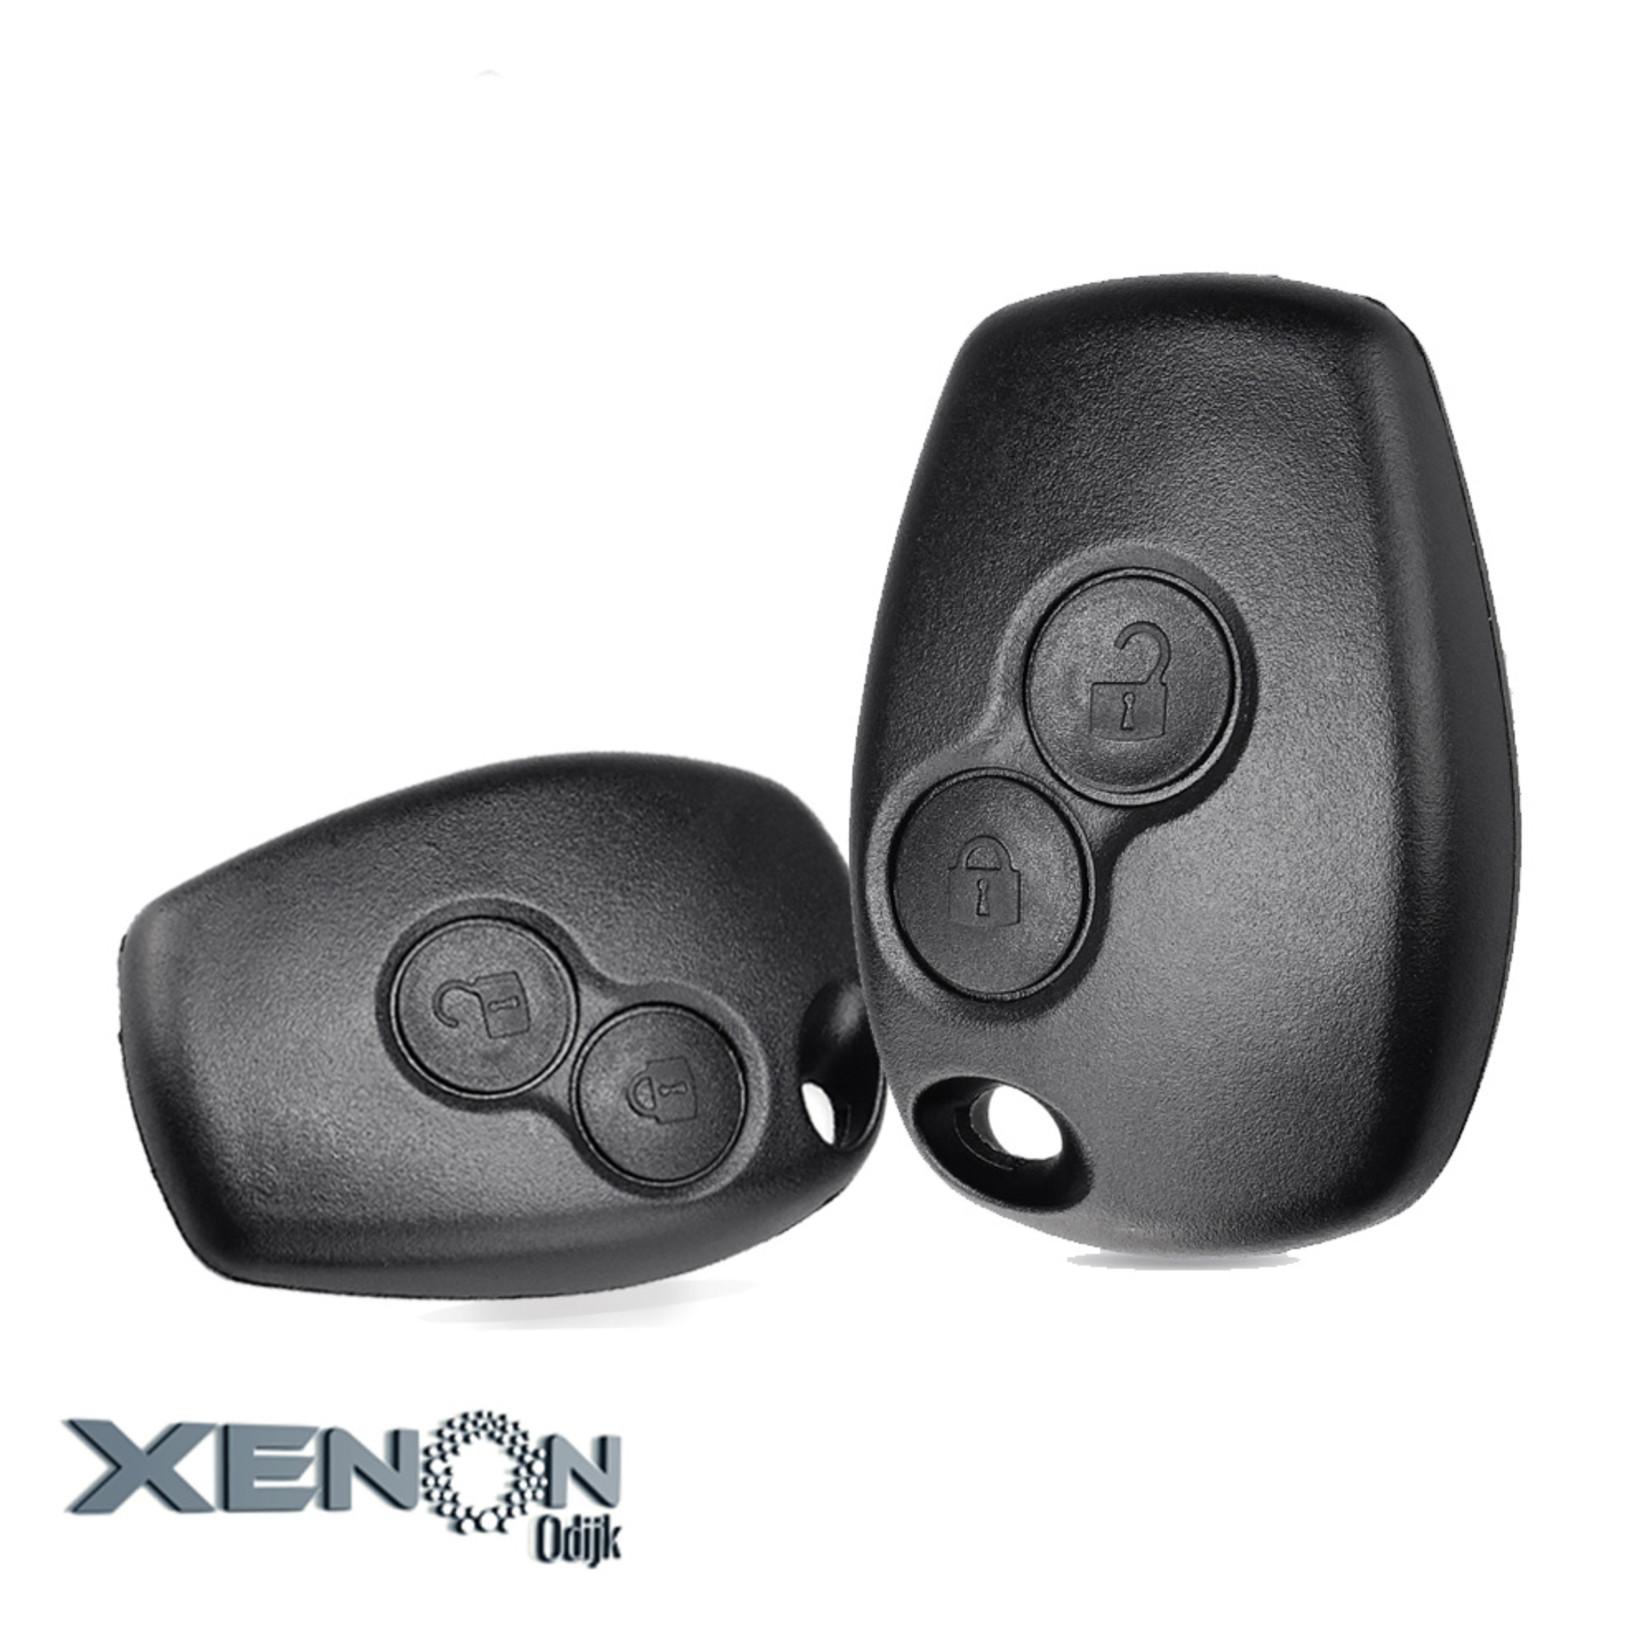 XEOD Dacia sleutelbehuizing